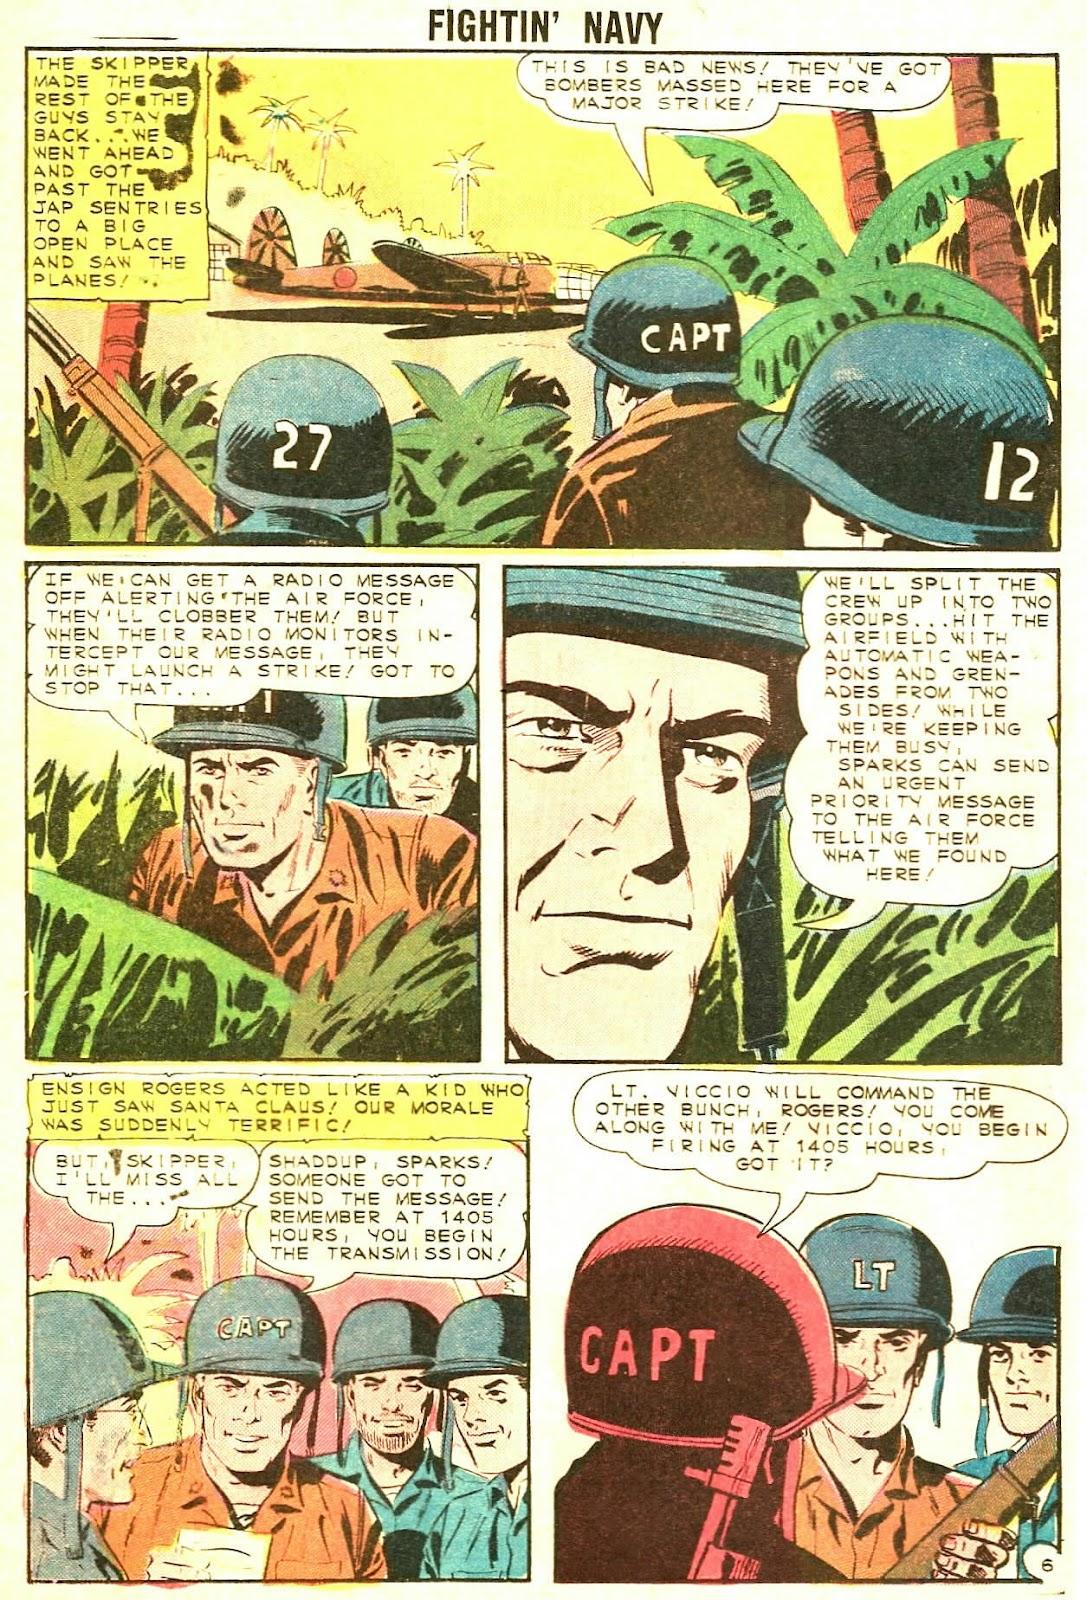 Read online Fightin' Navy comic -  Issue #117 - 20